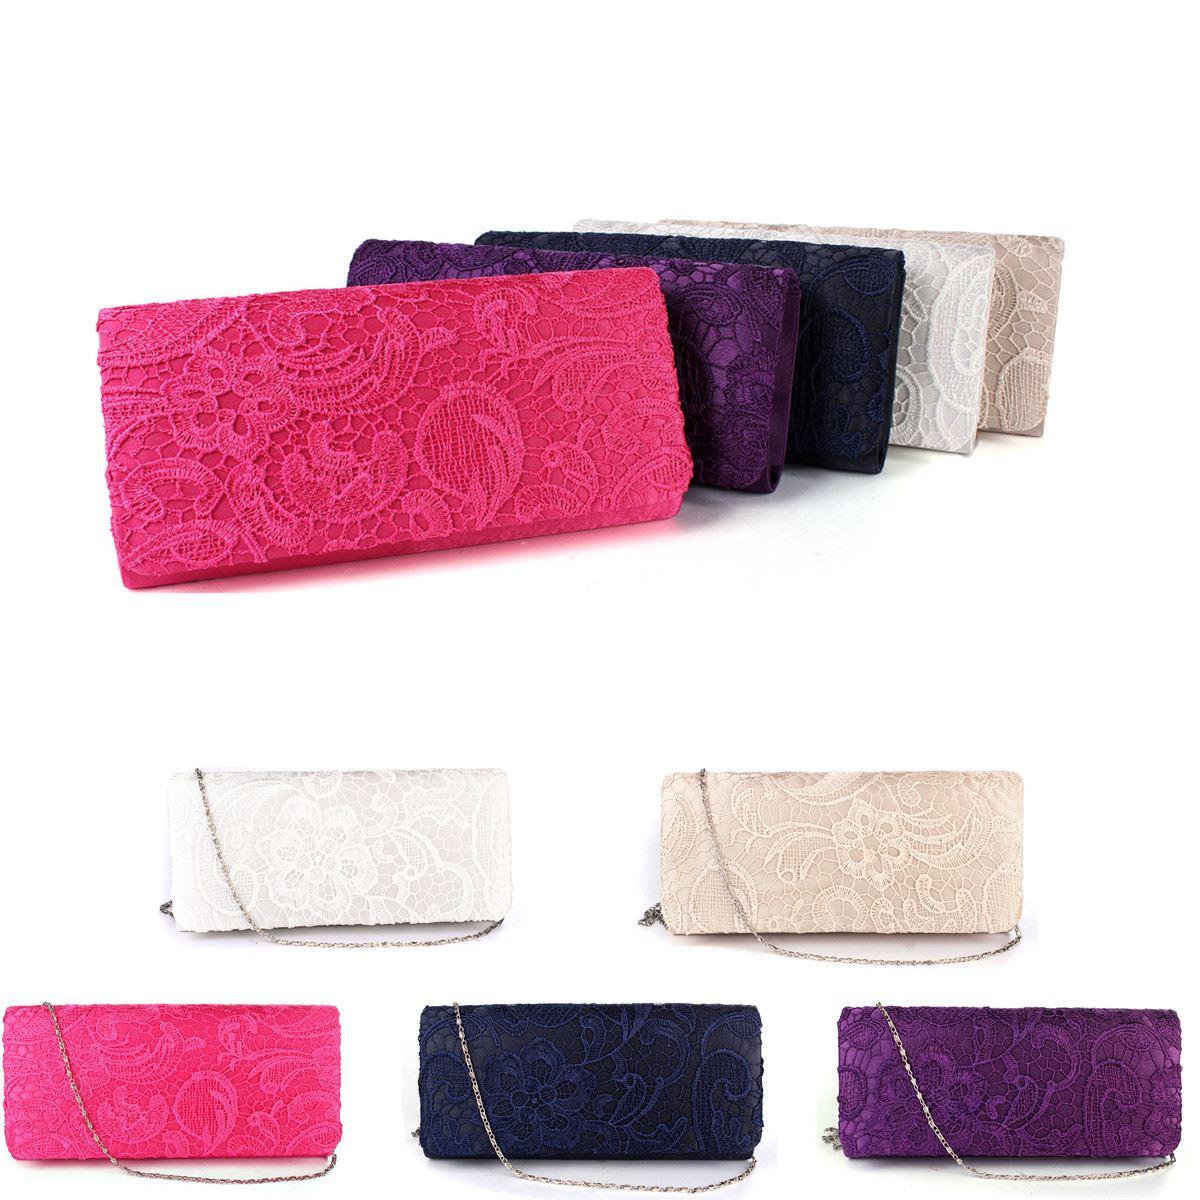 Aliexpress.com : Buy AEQUEEN Bridal Wedding Satin Evening Bags ...